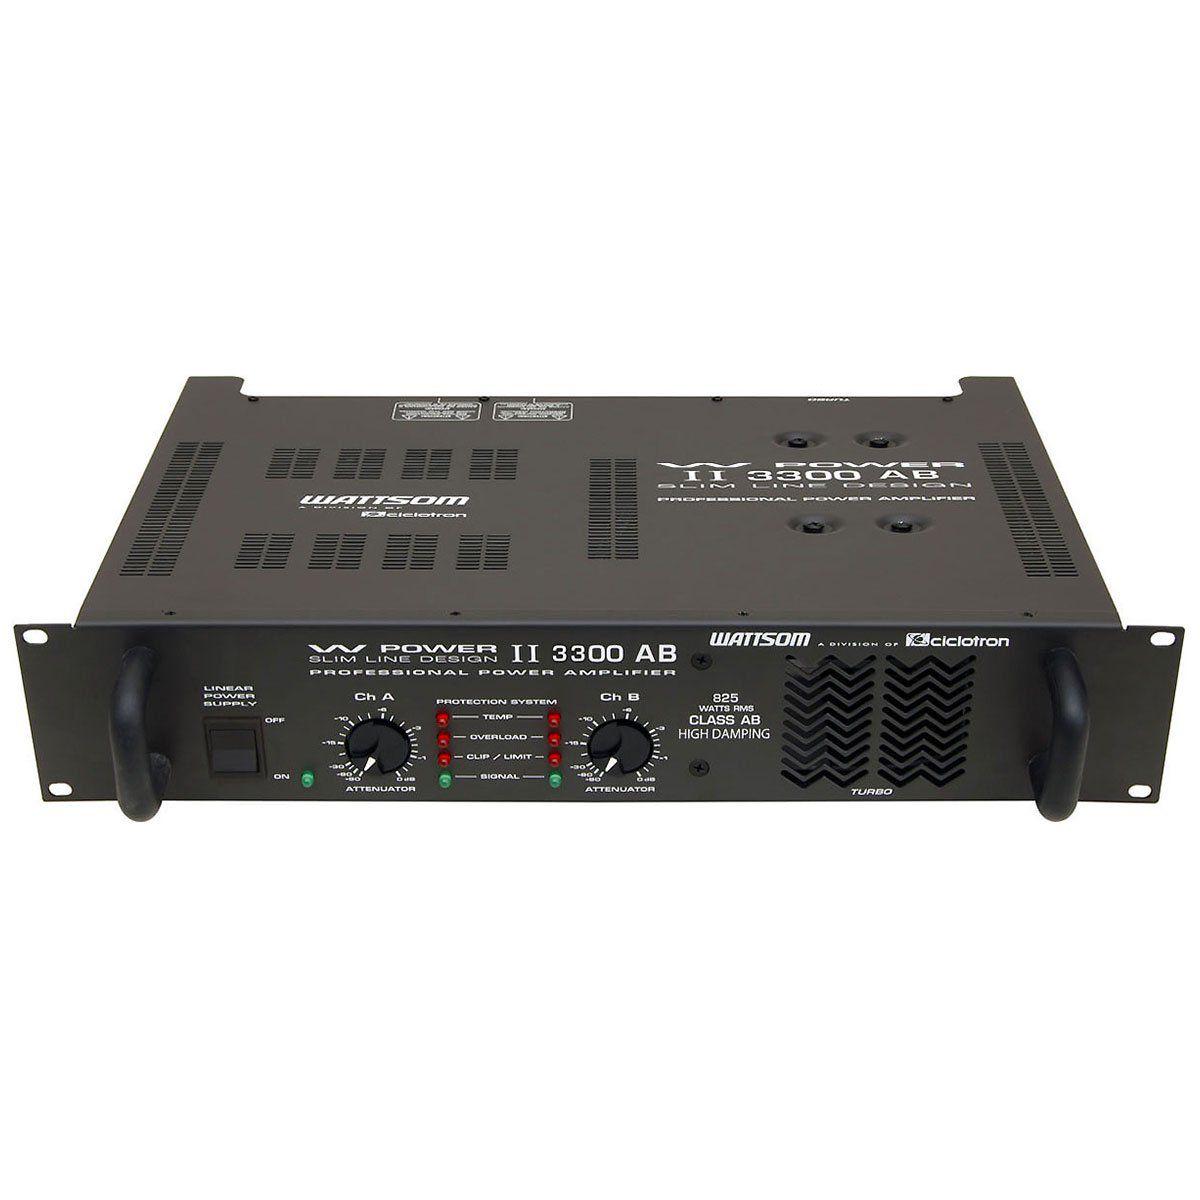 Amplificador de Potência 825W 4 Ohms - W POWER II 3300 AB Ciclotron